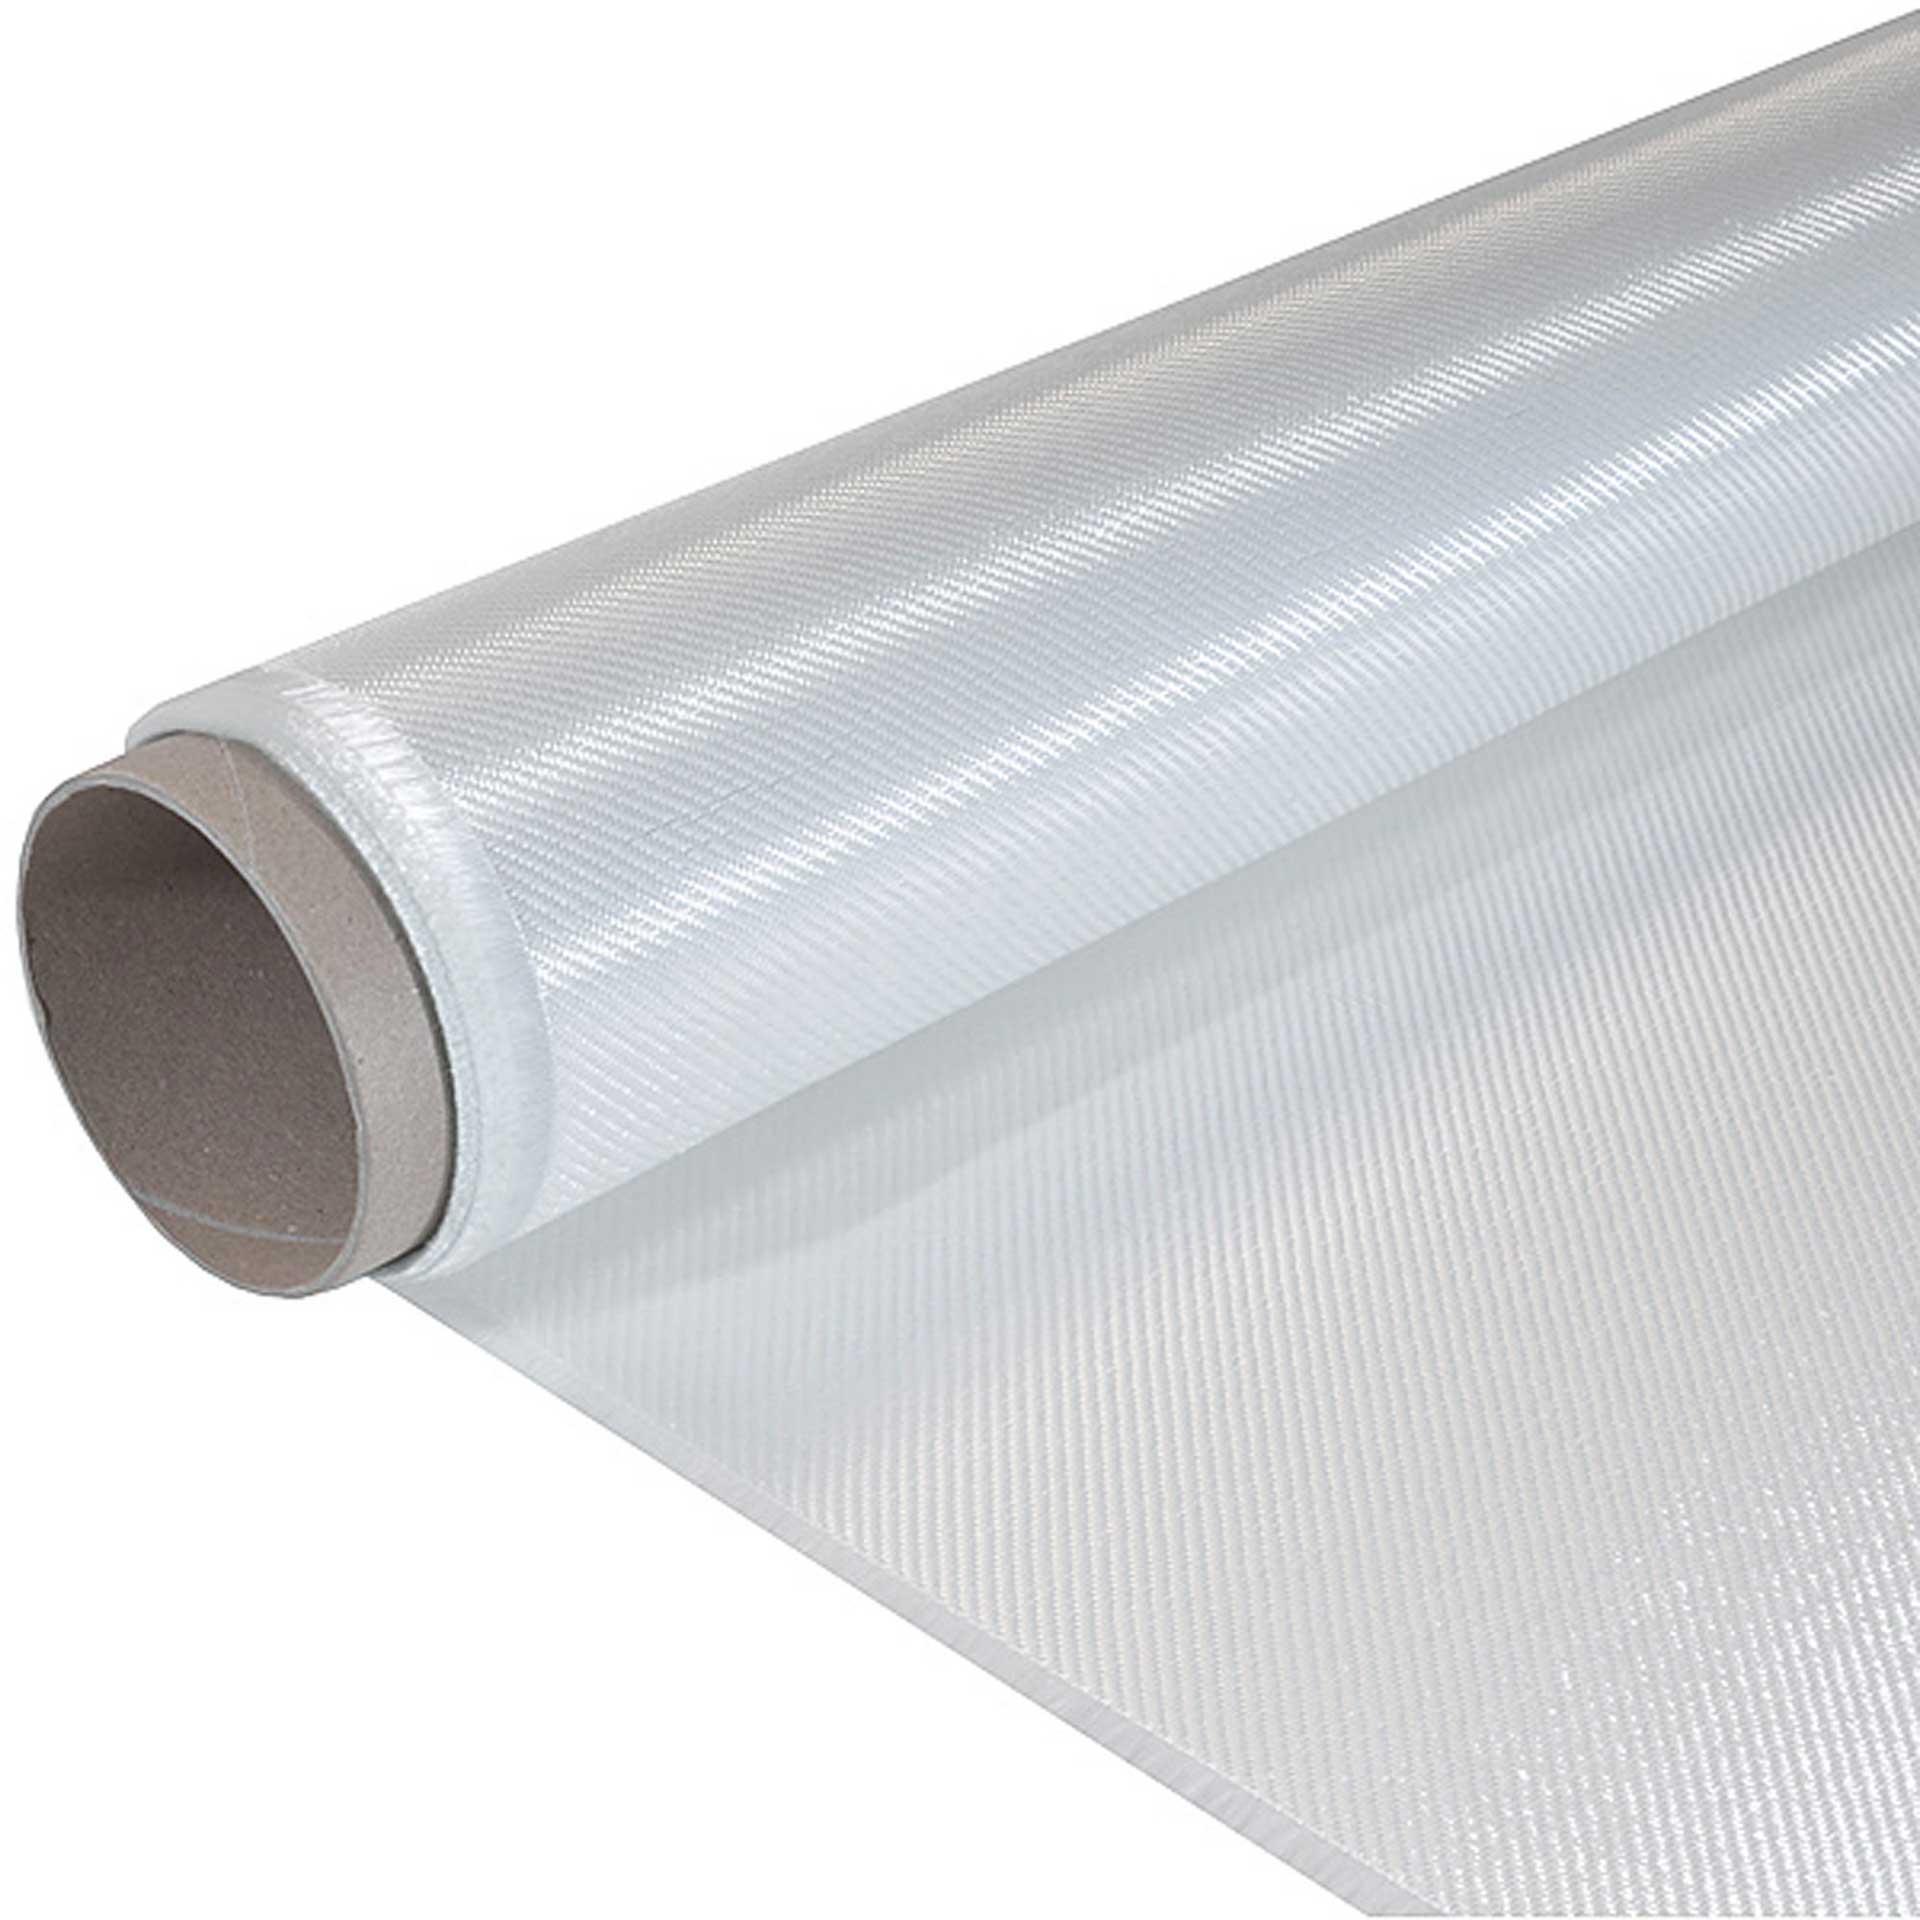 R&G Glasgewebe 80 g/m² (Köper) 100 cm, Rolle/ 20 m